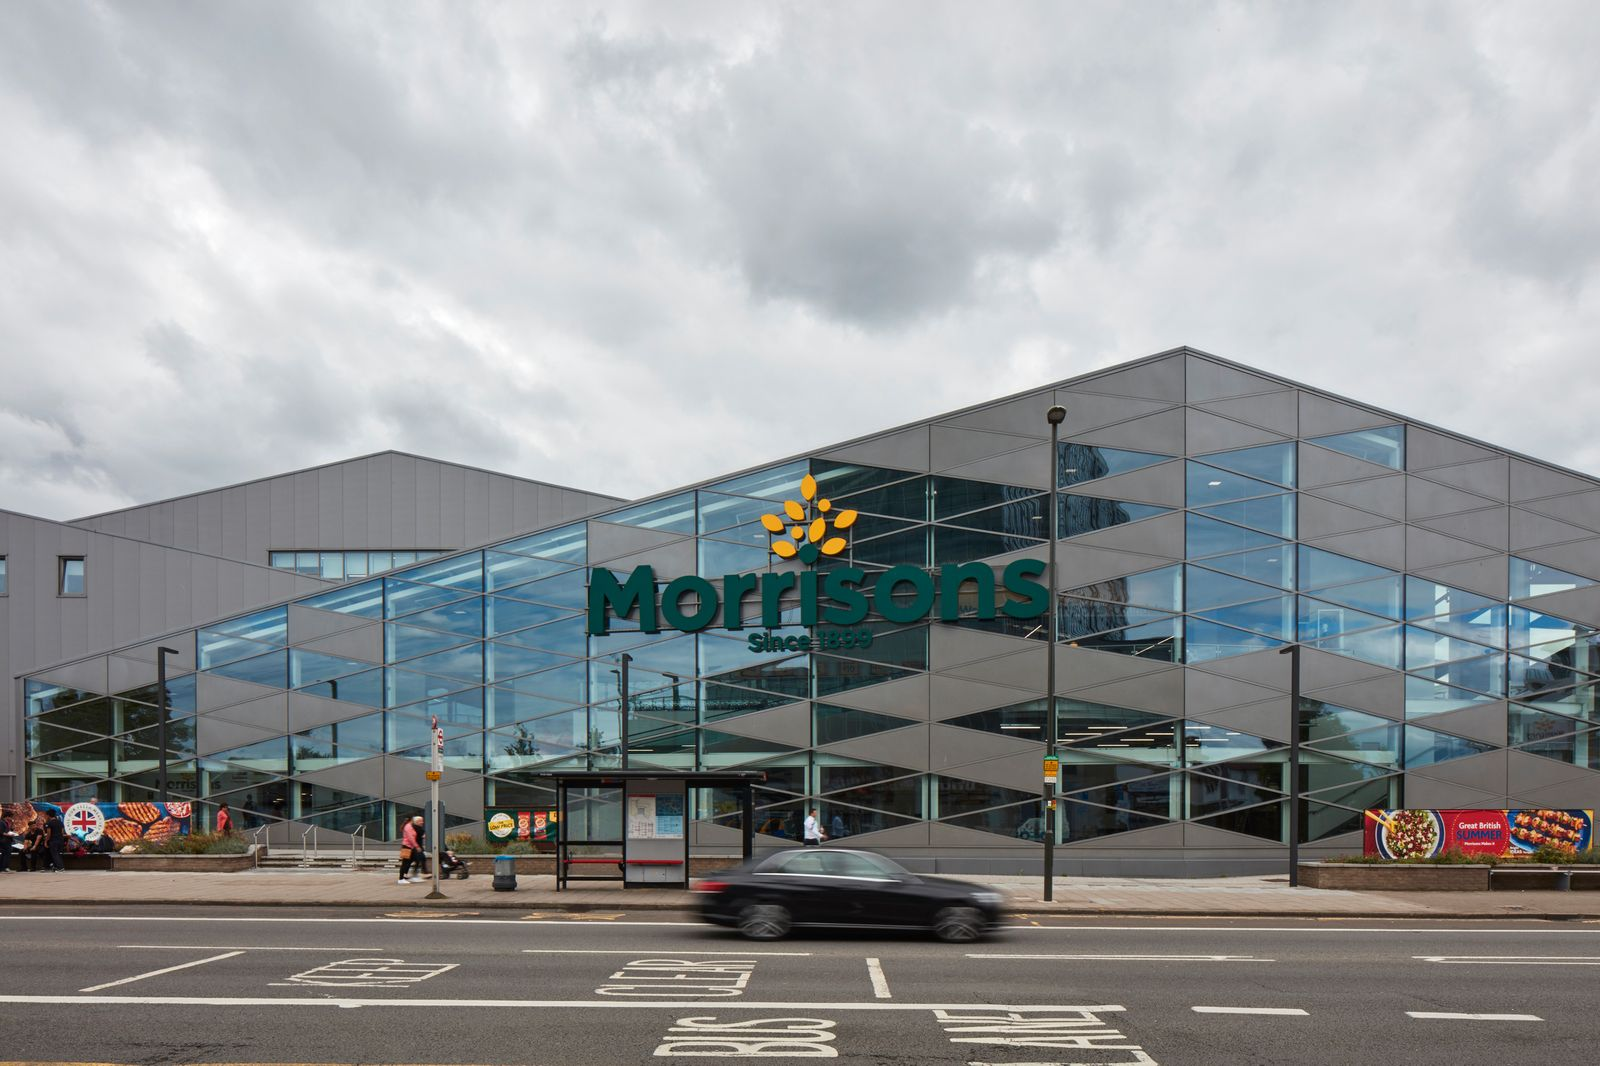 Morrisons, Colindale, London, United Kingdom. Architect: n/a, 2017.